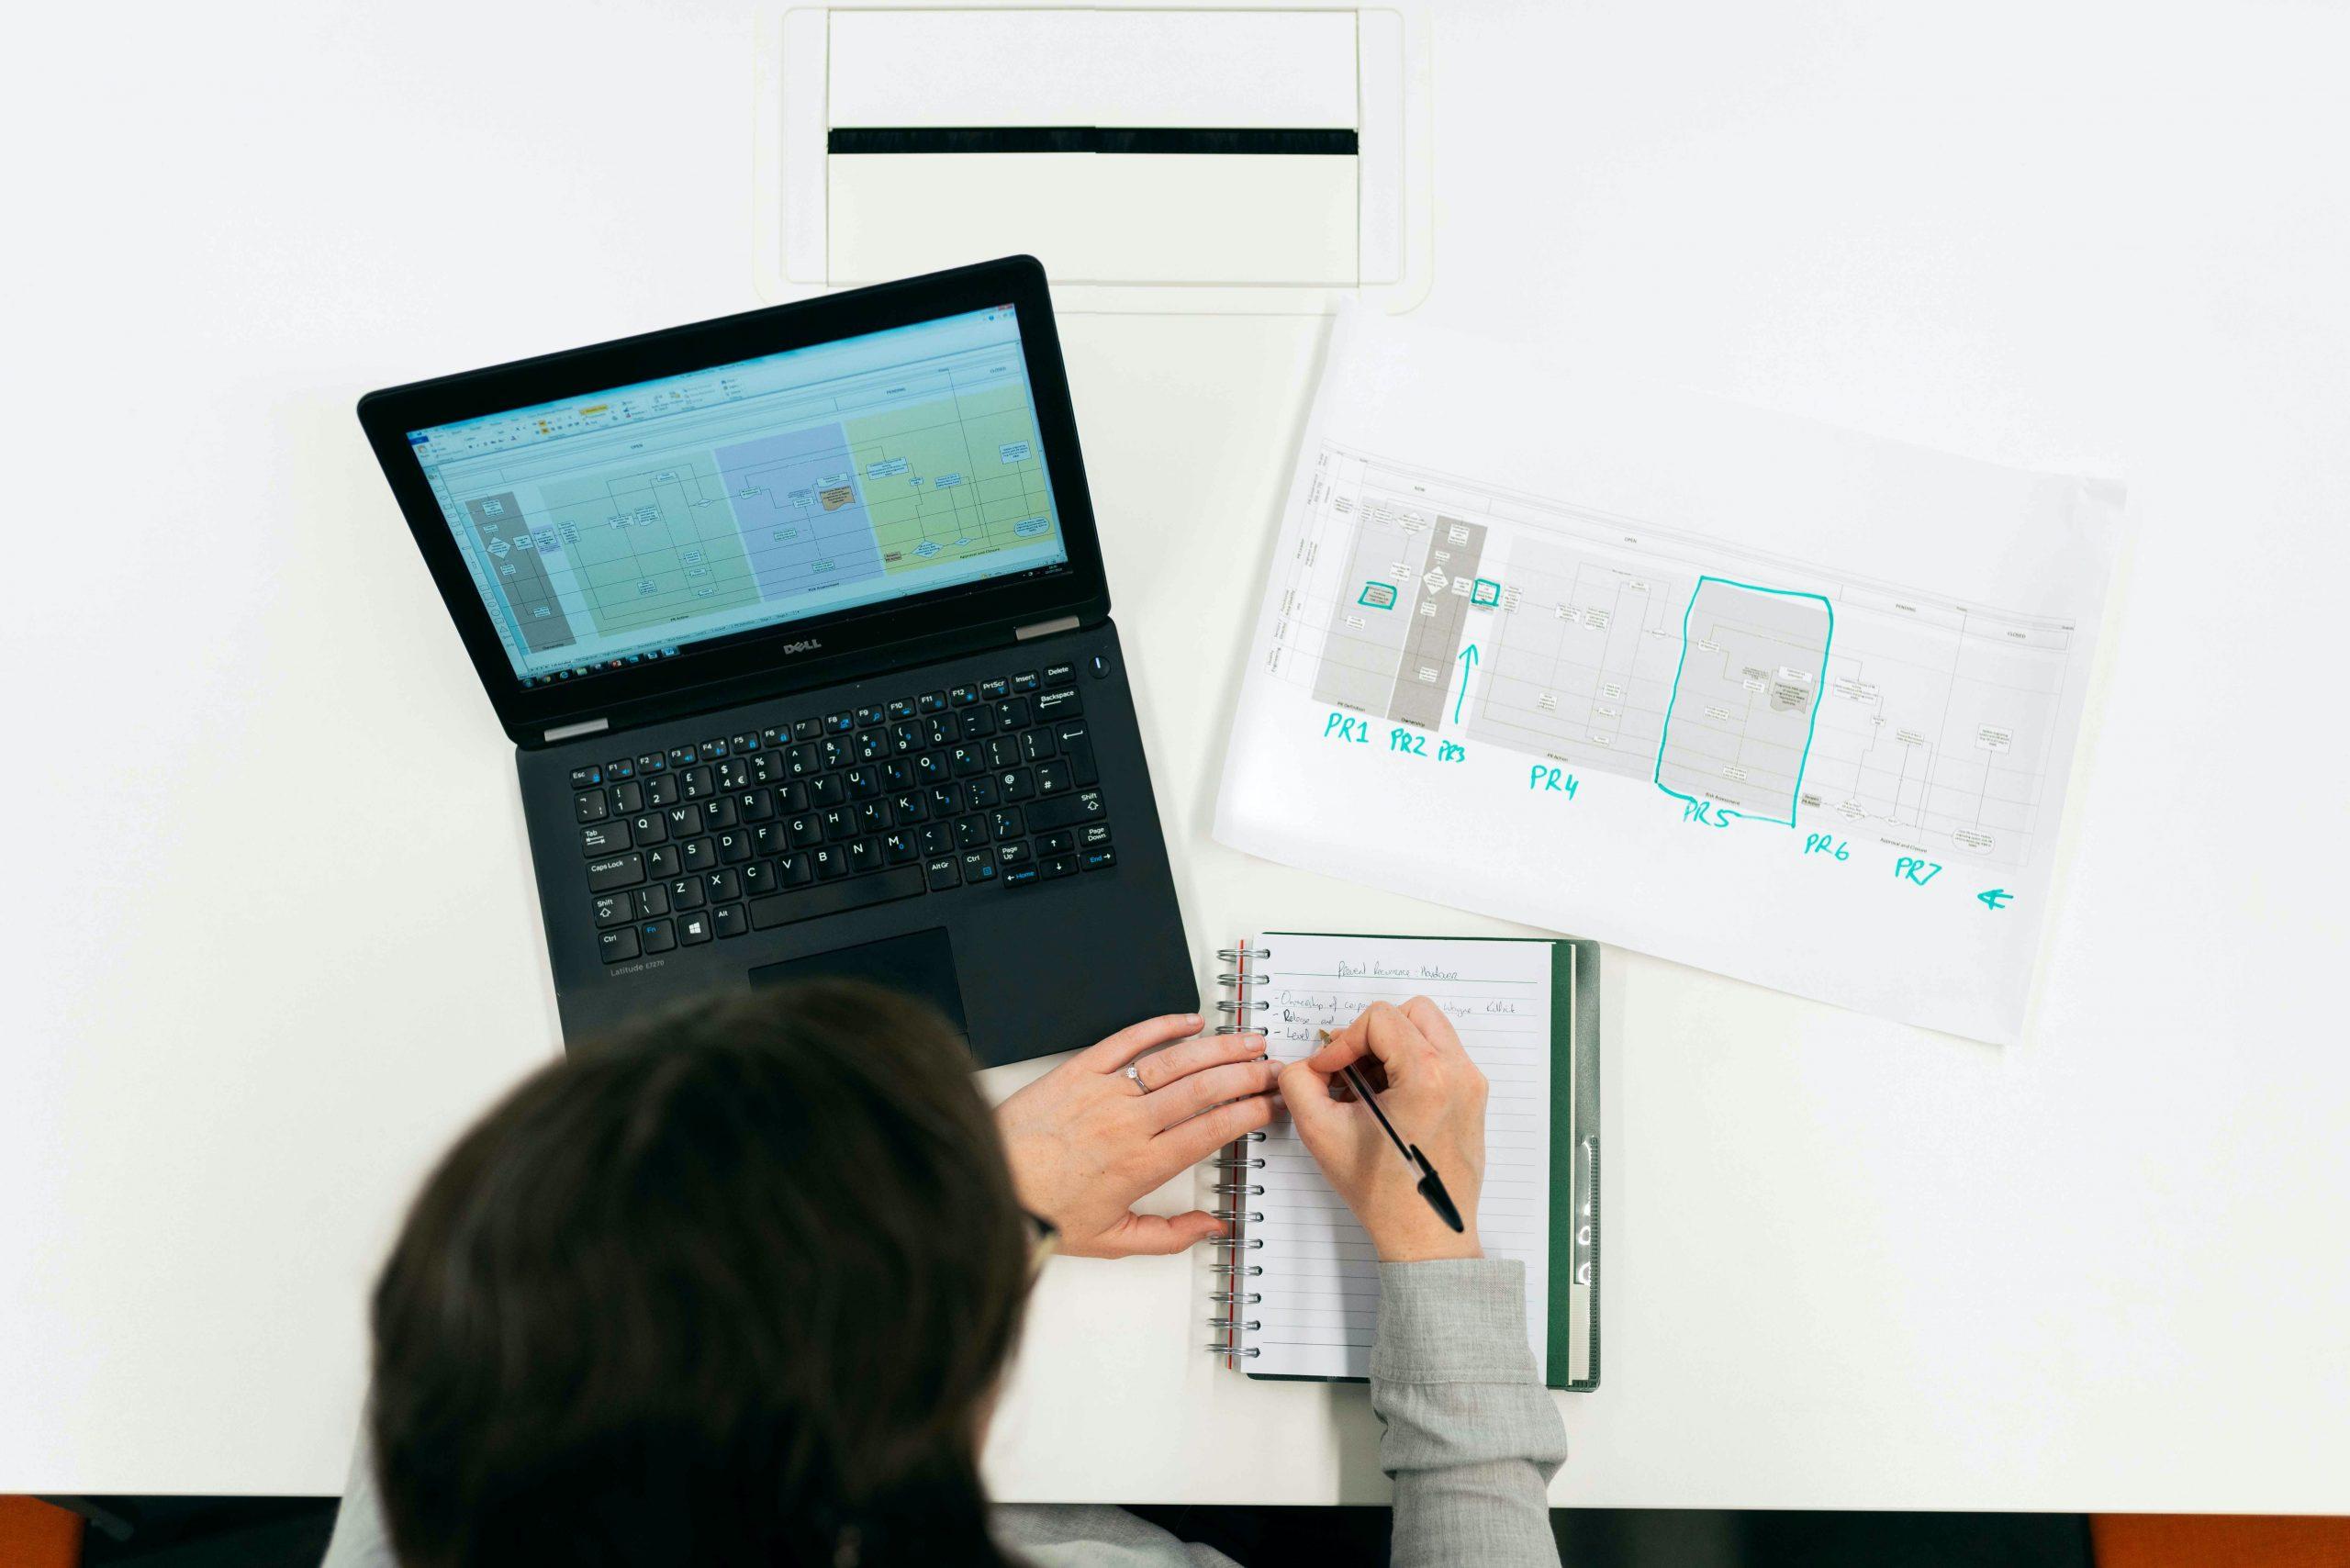 Engineering design ideation drafting